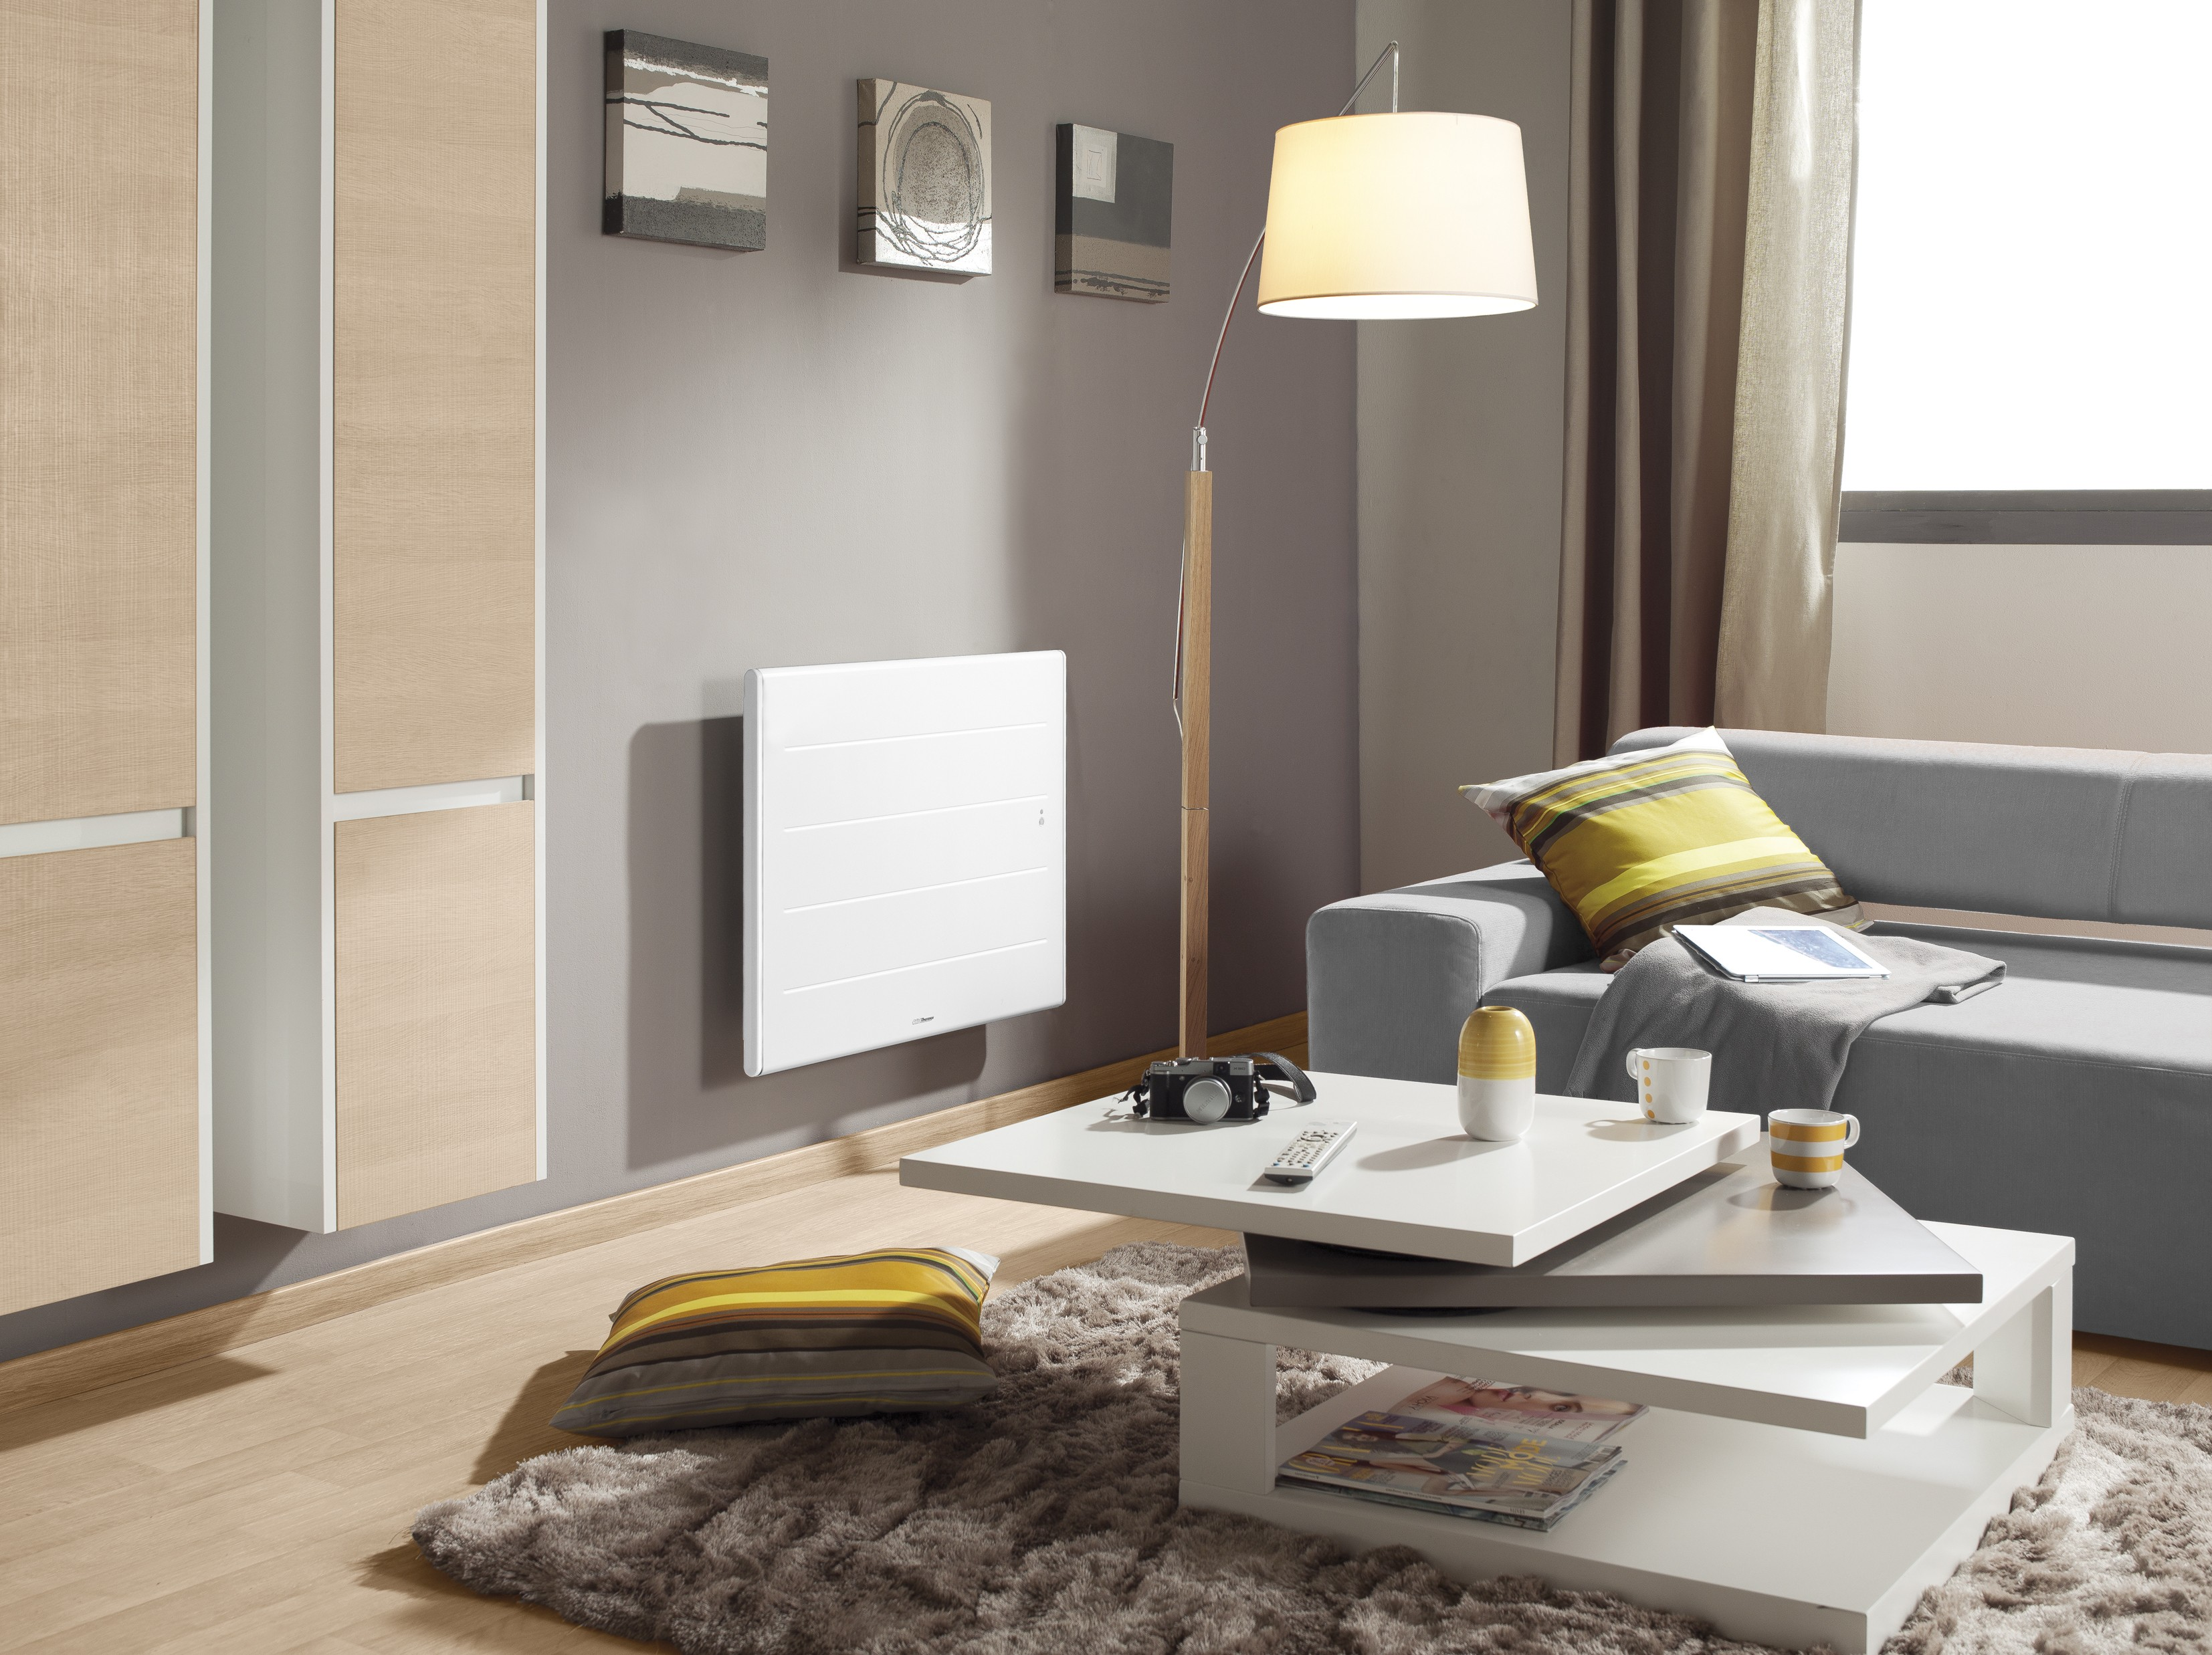 radiateur salle de bain thermor. Black Bedroom Furniture Sets. Home Design Ideas